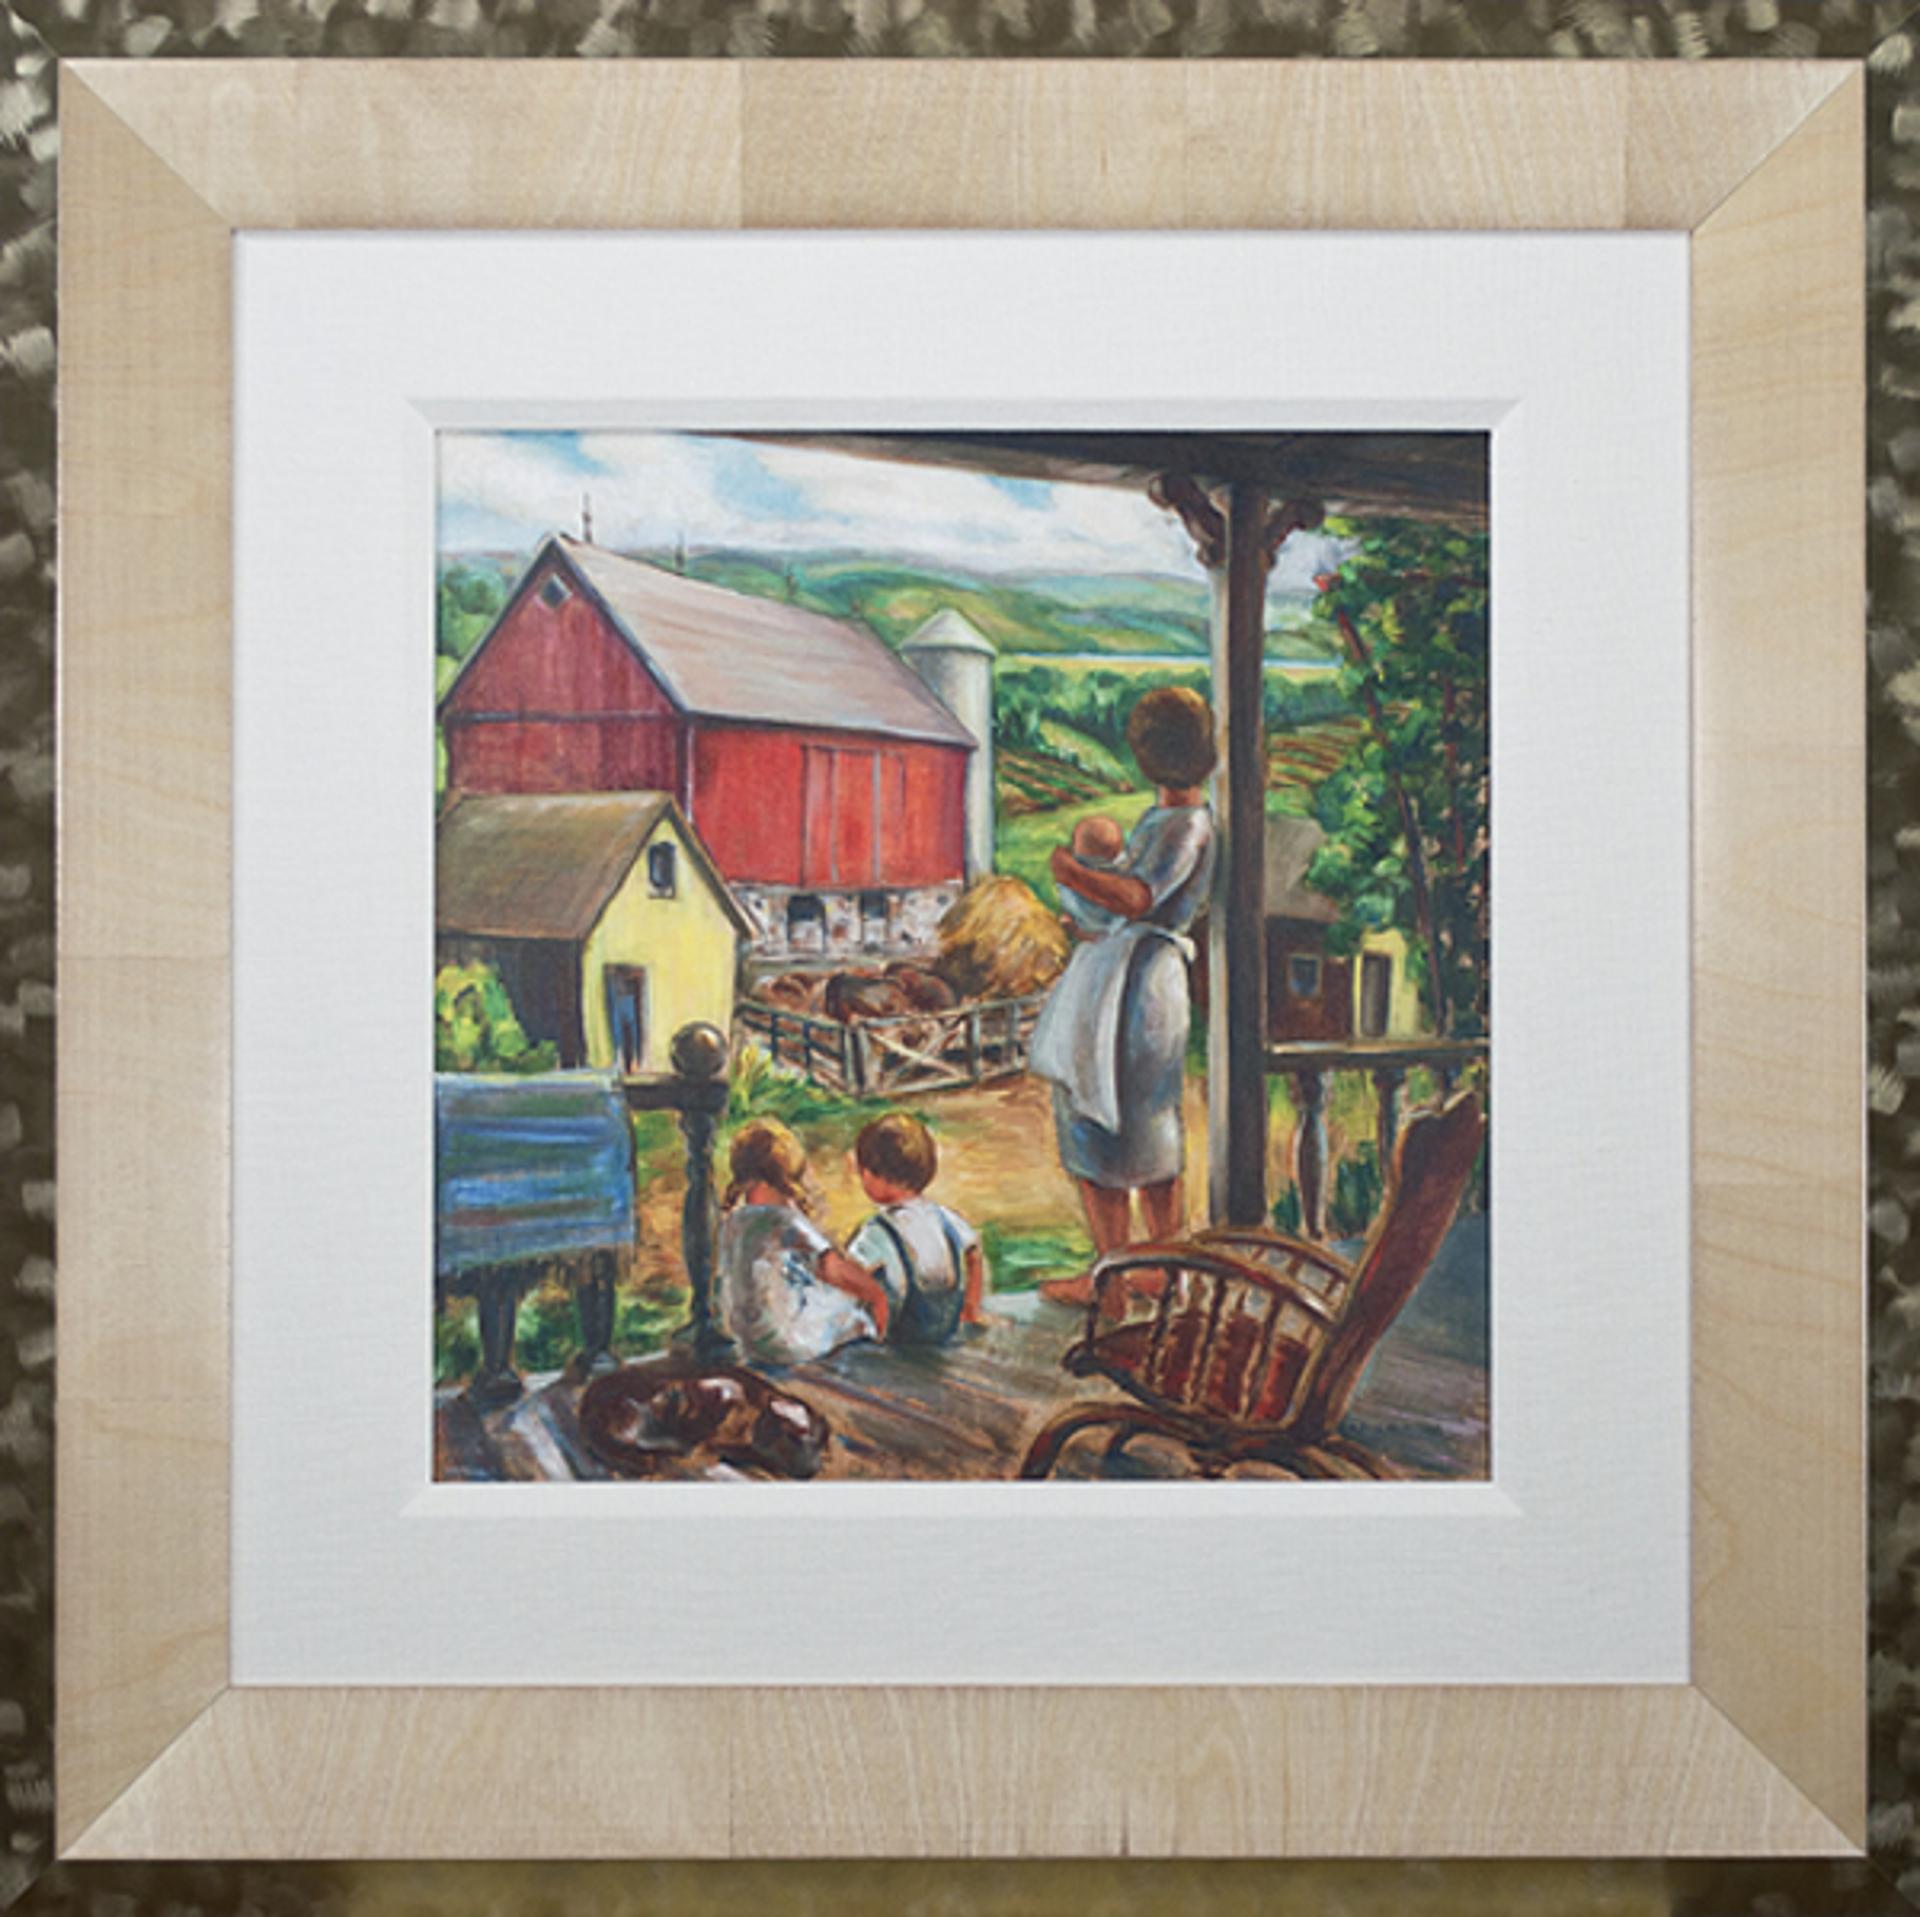 Farm Scene: Farmer's Wife With Children - Big Cedar Lake by Sylvia Spicuzza